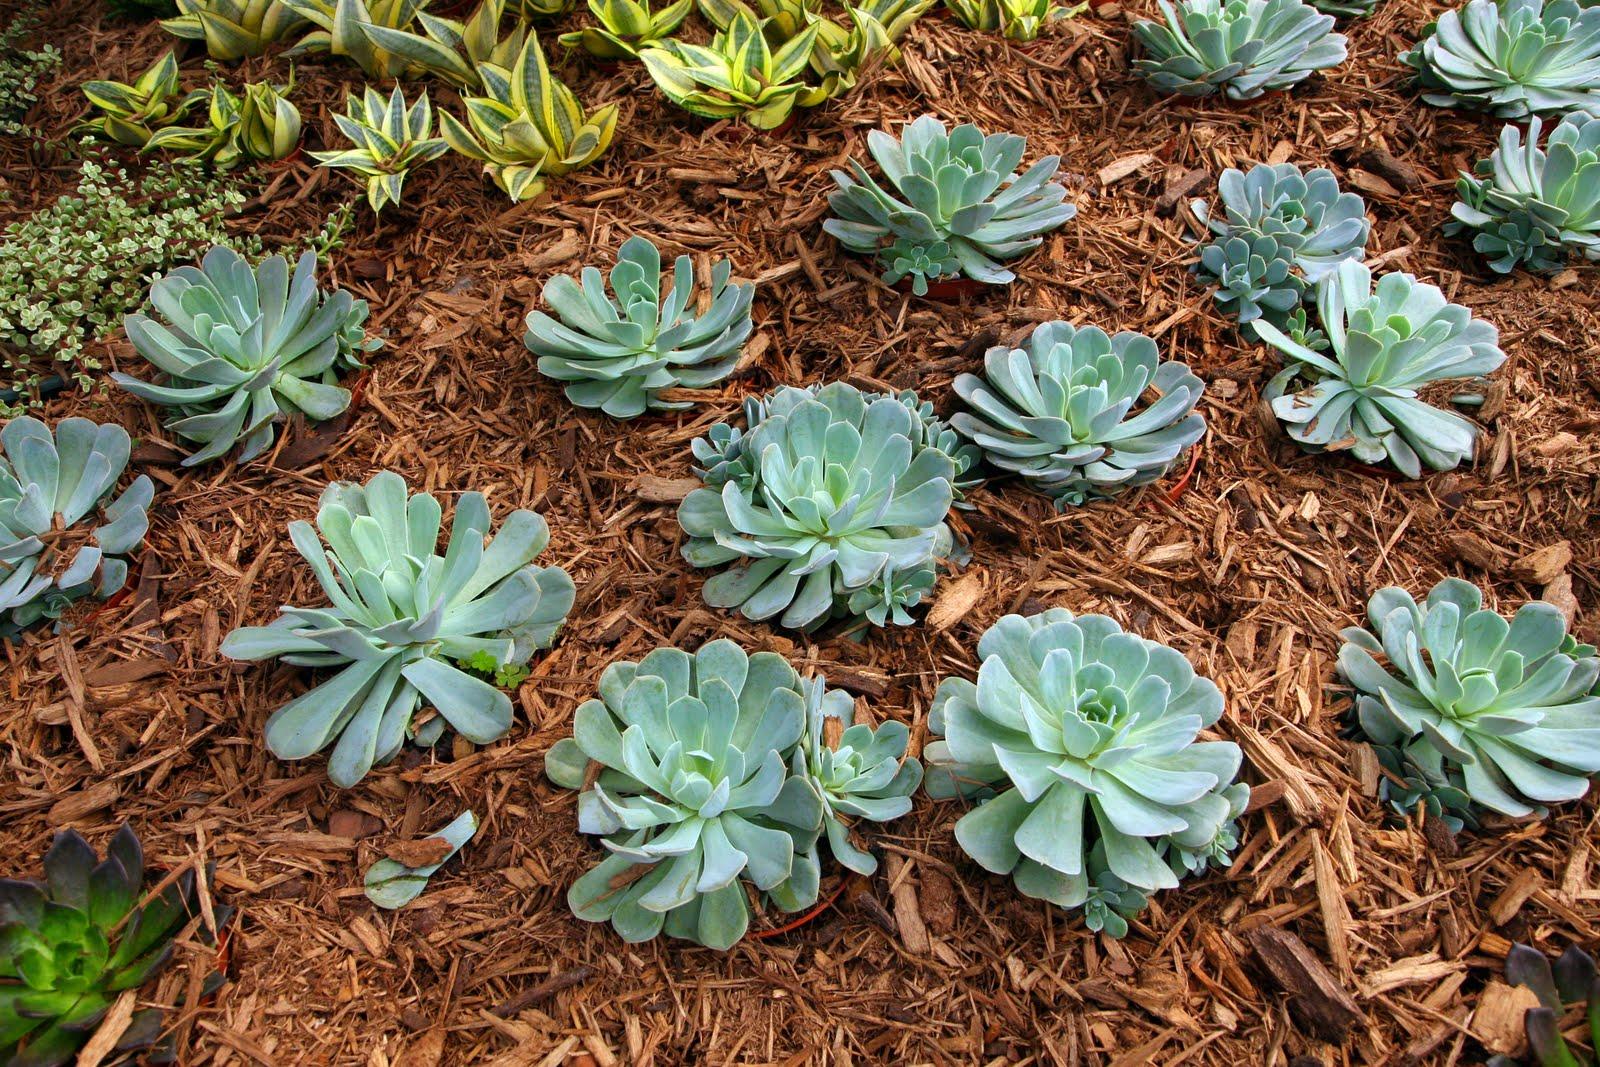 The Garden Plot Drought tolerant plants that can beat the heat